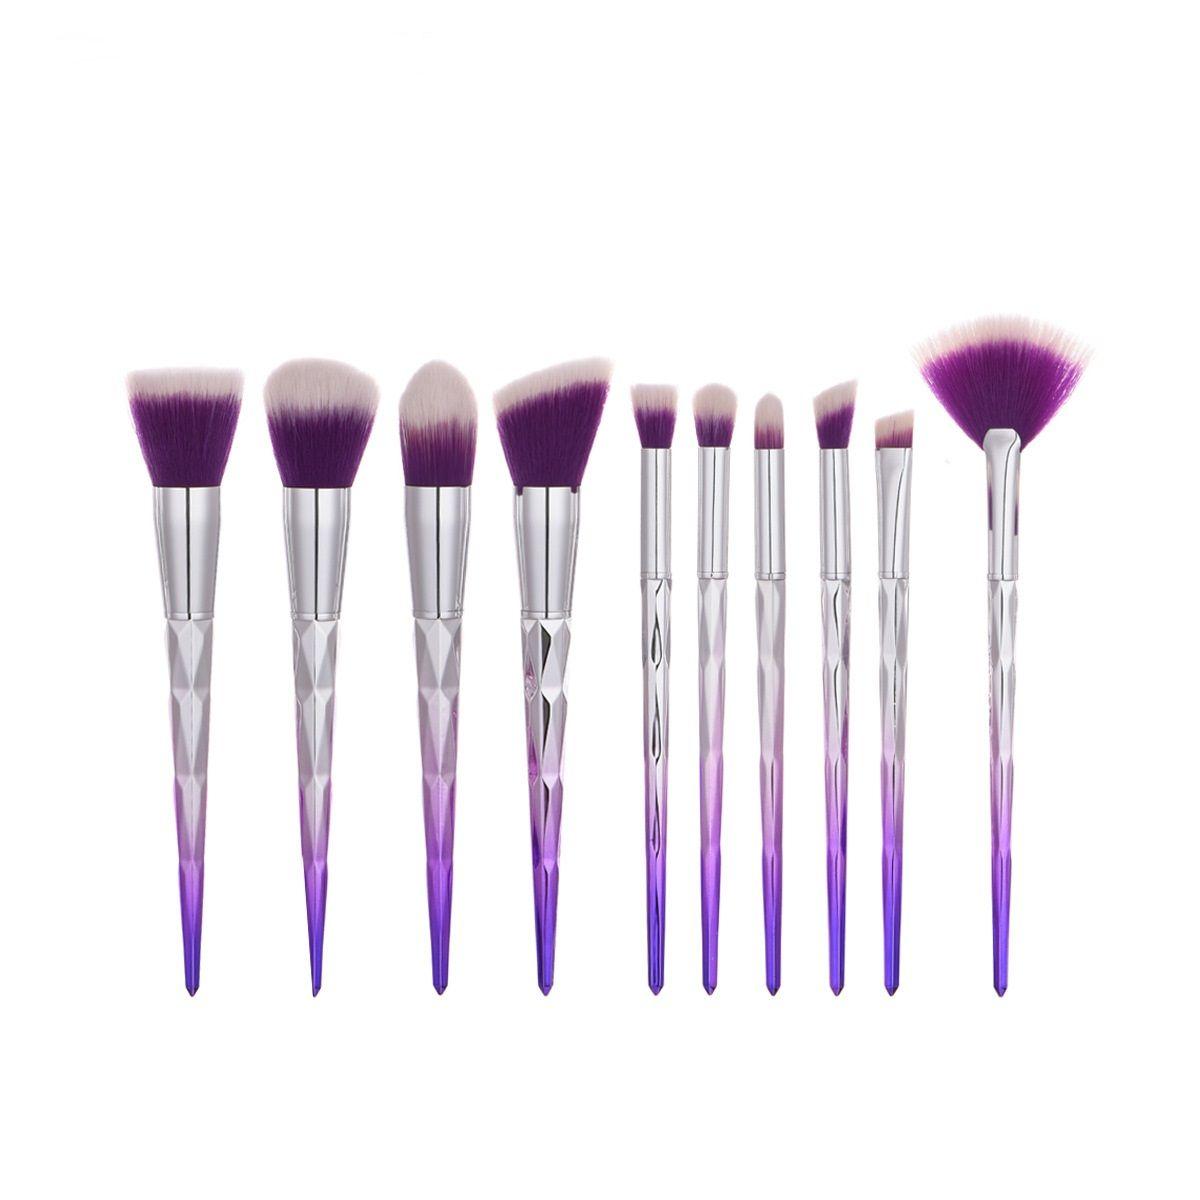 Set de cepillos de maquillaje de sirena 10 unids Profesional Forma de diamante Pinceles Sombra de ojos Colorete en polvo Mezcla Cosmética Maíz Forma Kit de cepillo